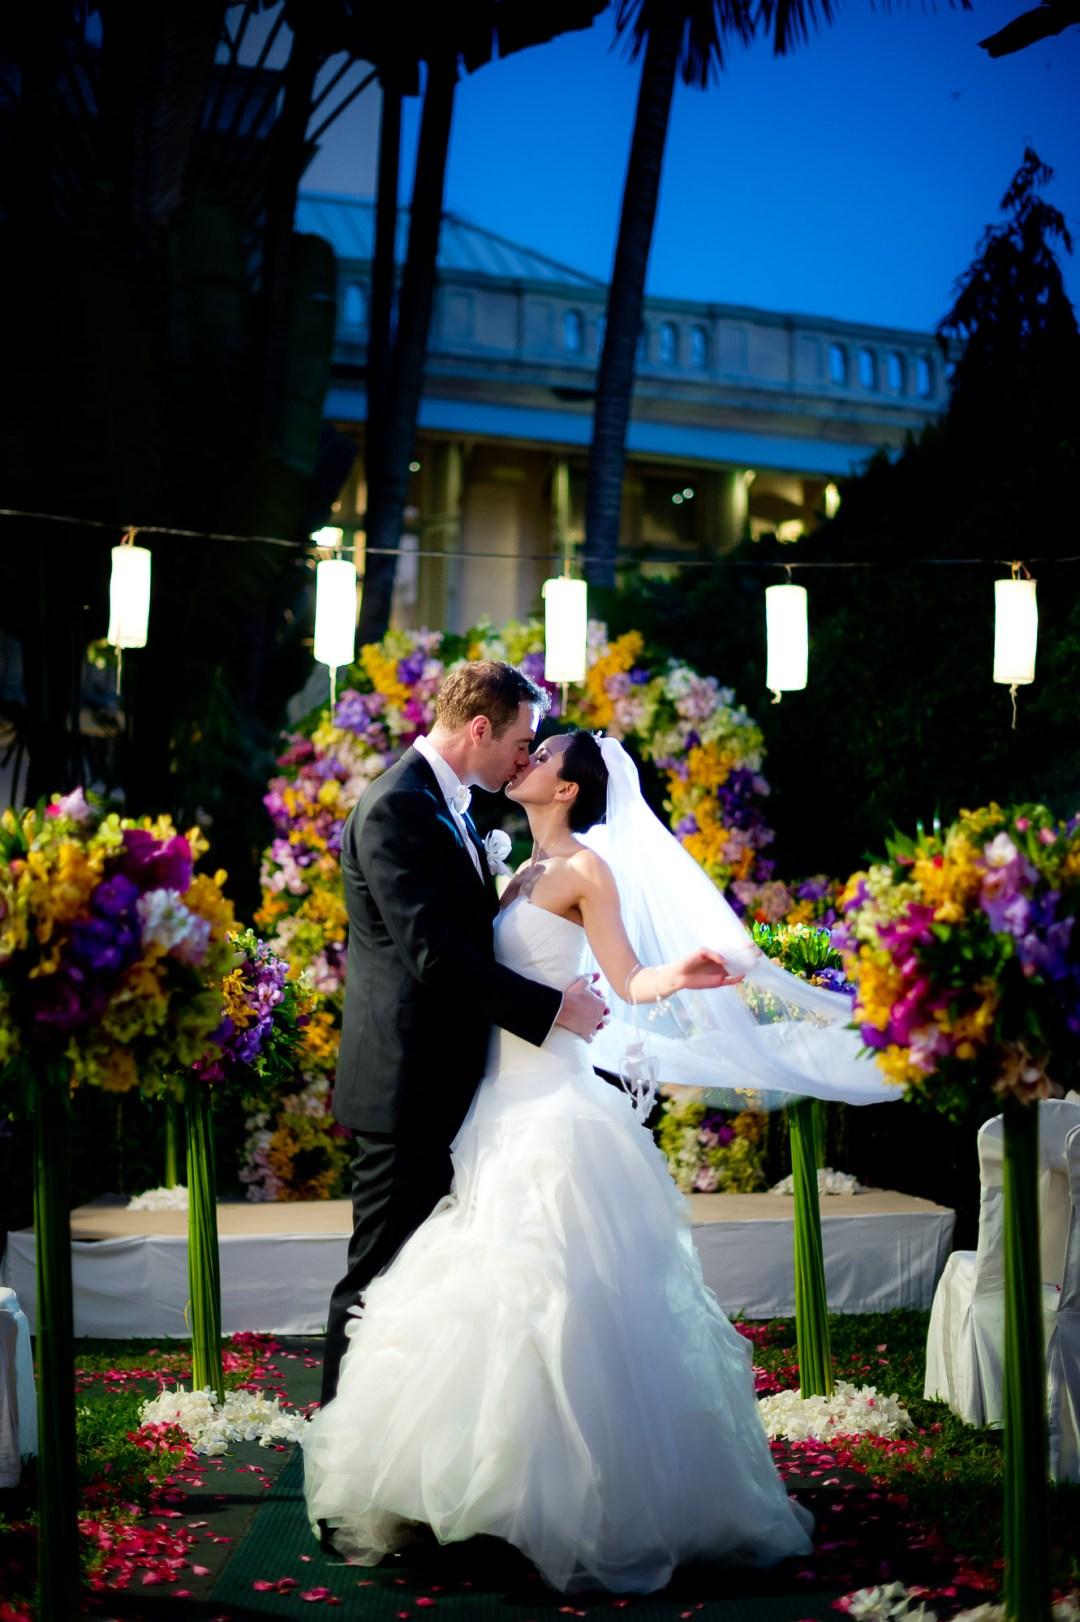 Thailand Wedding Photography | Mandarin Oriental Bangkok Wedding